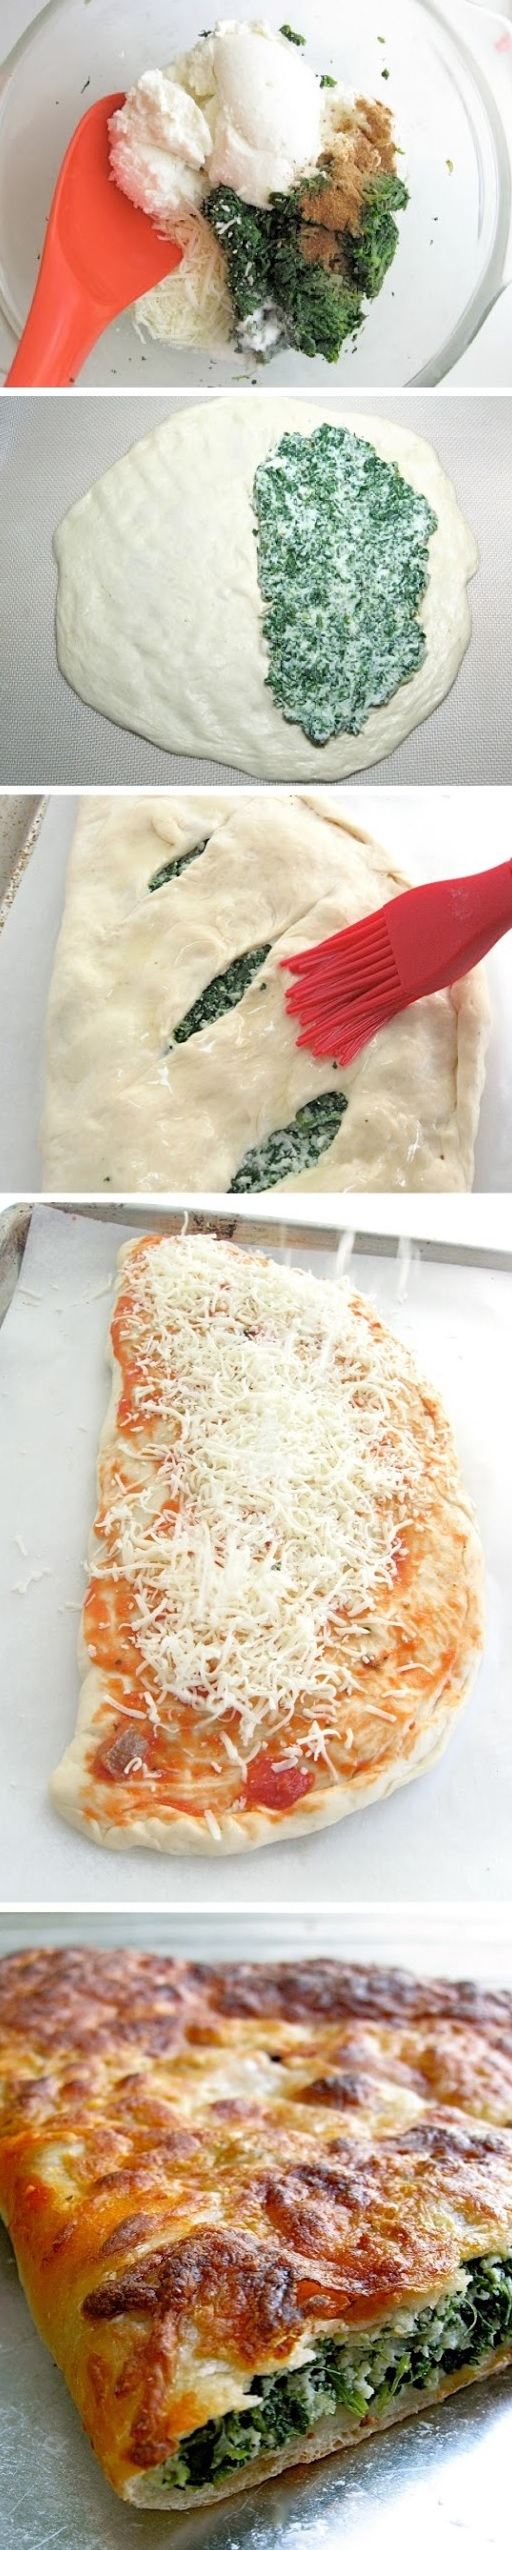 Spinach Ricotta Calzones